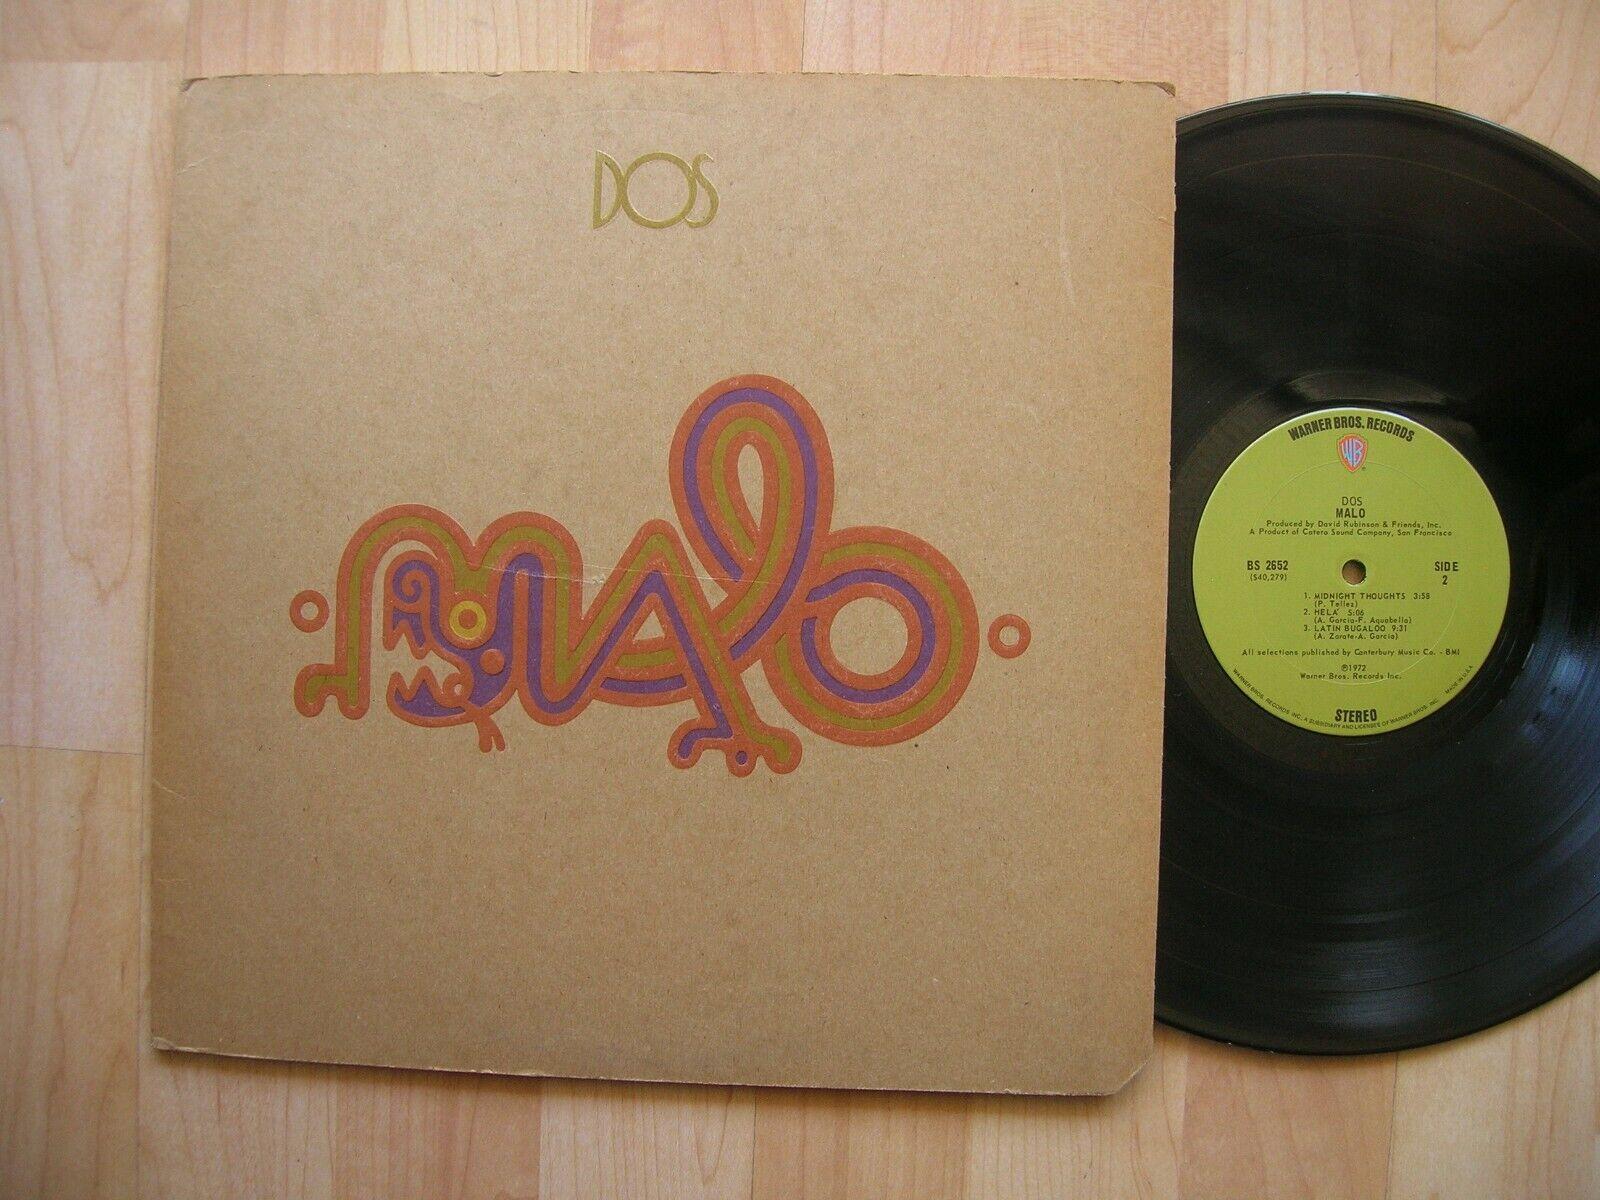 MALO Dos Warner BS 2652 Orig 1972 1st Latin Funk Psych Santana NM  - $6.11